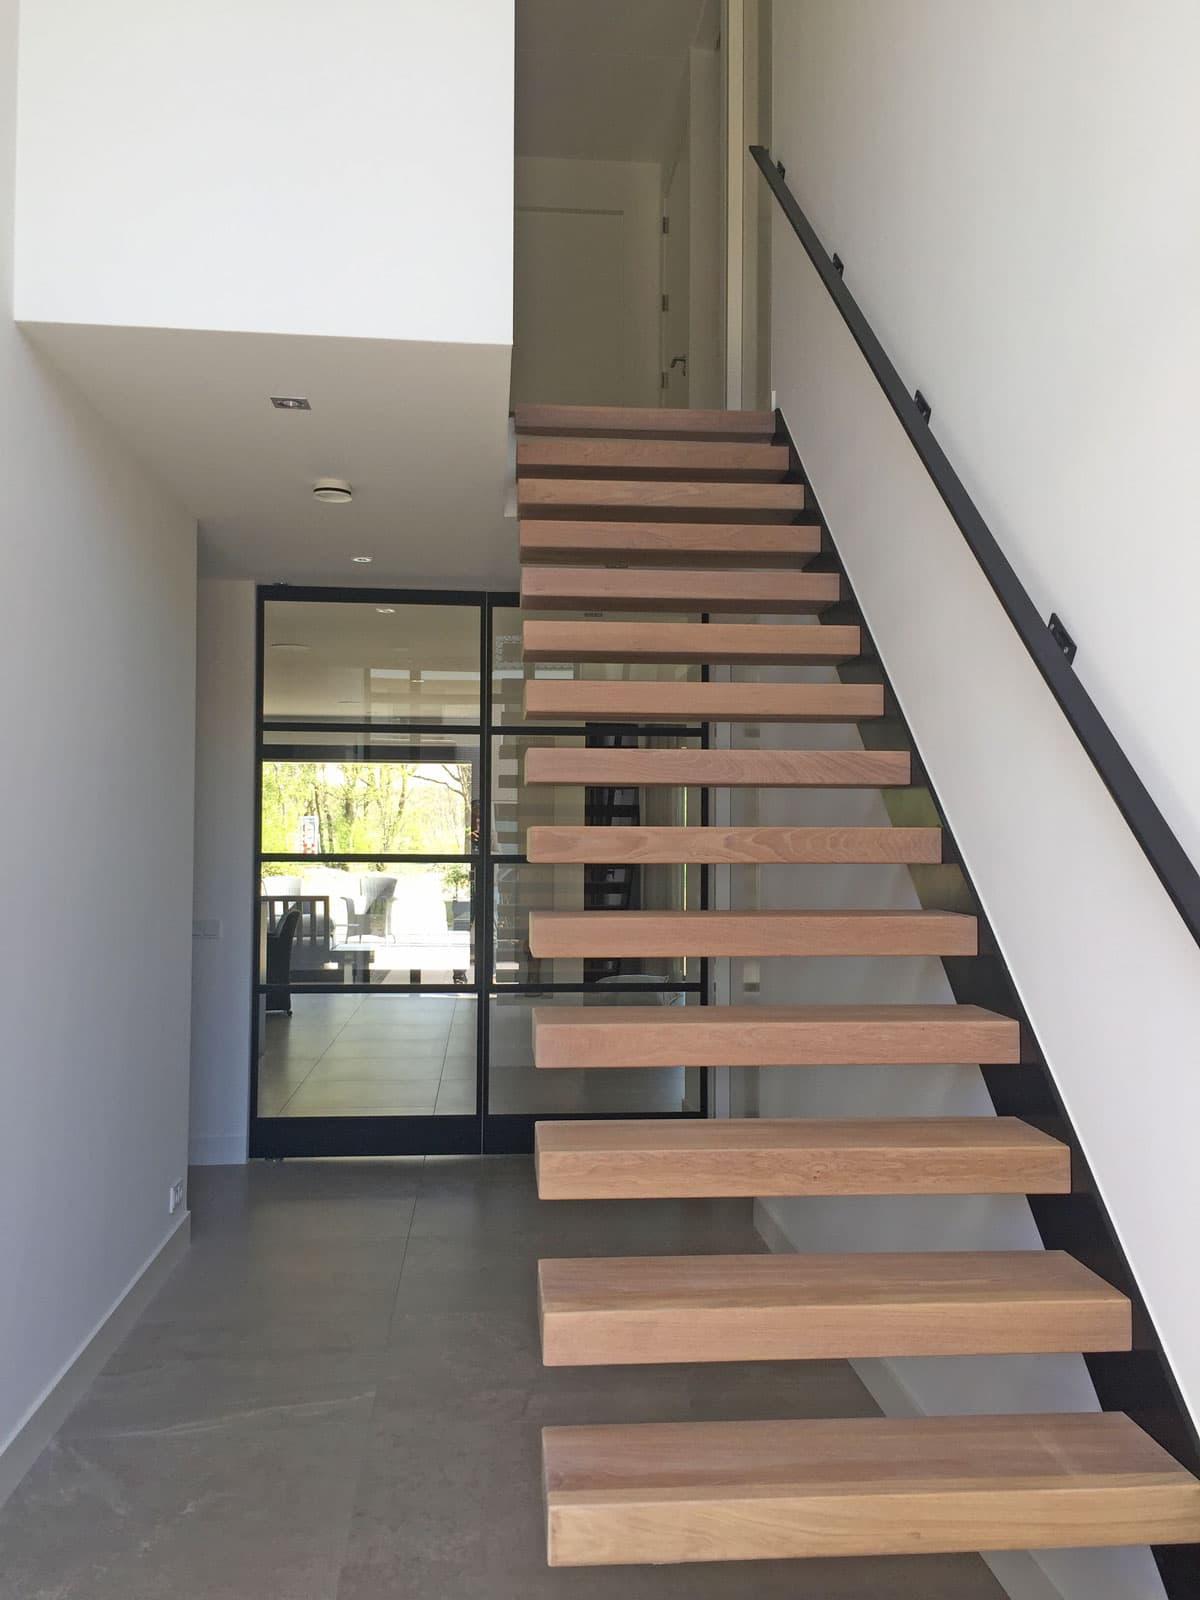 zt25a zwevende trap